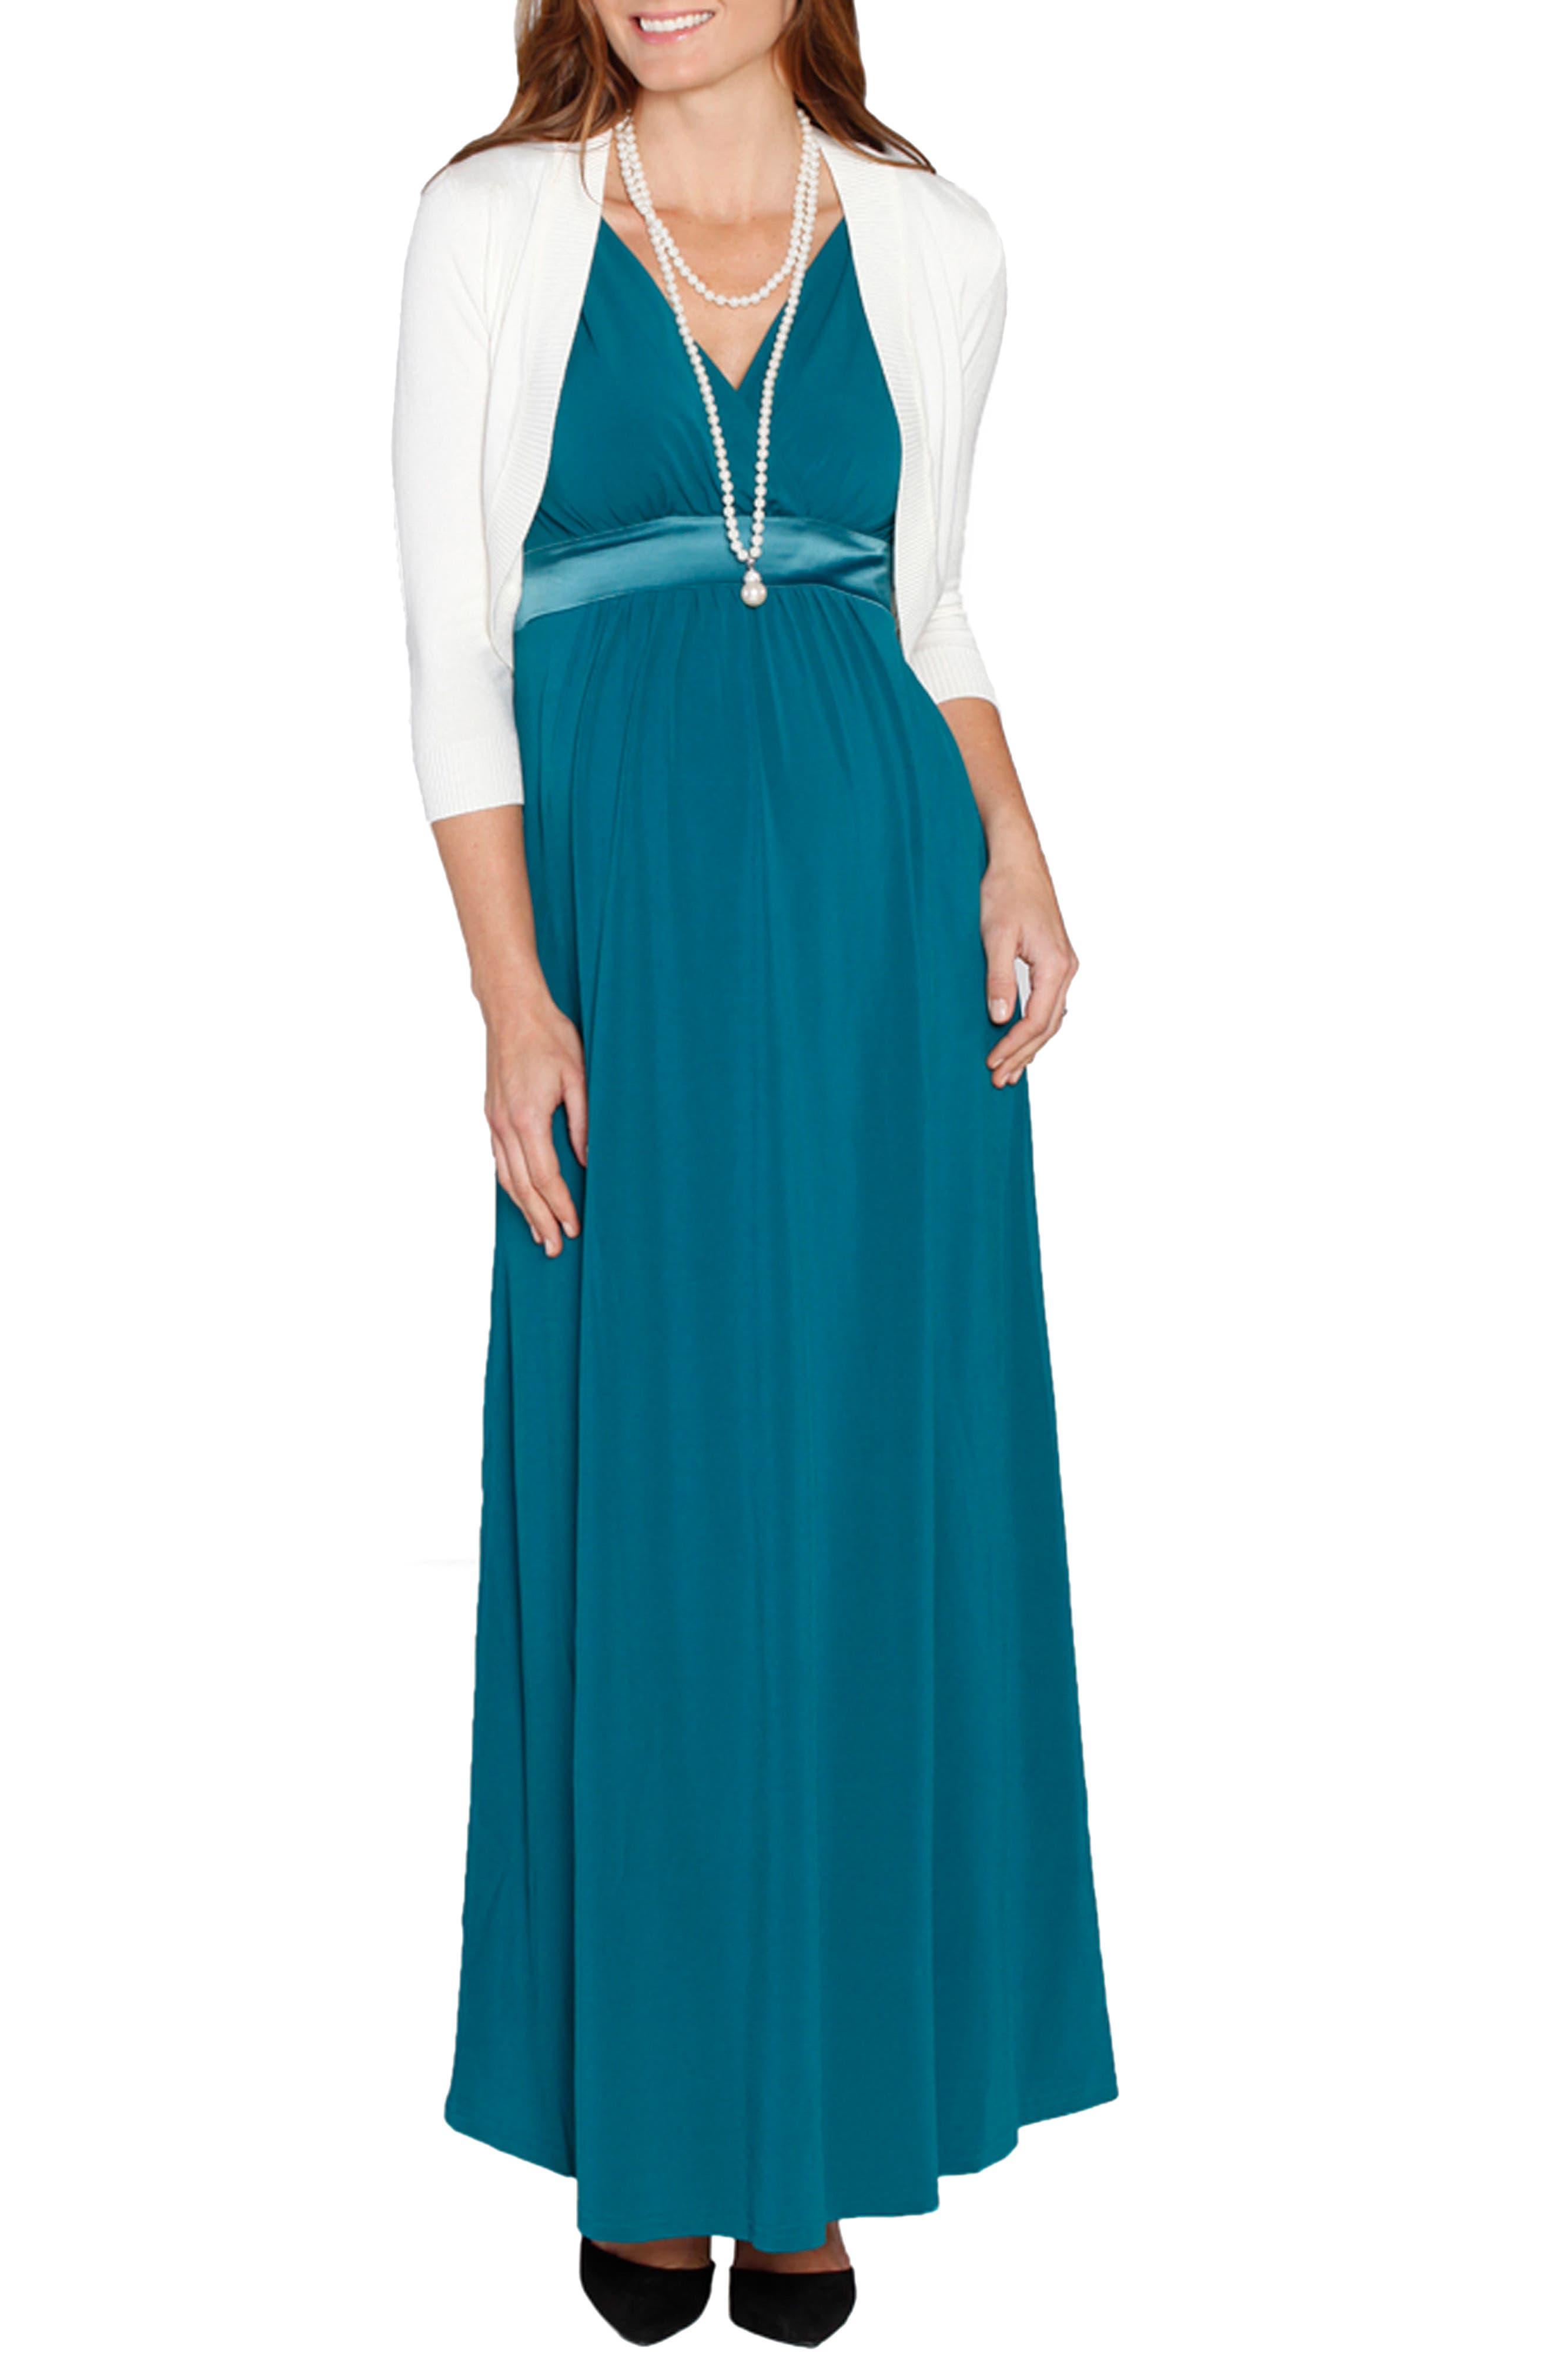 Angel Tie Waist Sleeveless Maternity/Nursing Gown & Bolero,                         Main,                         color, 440